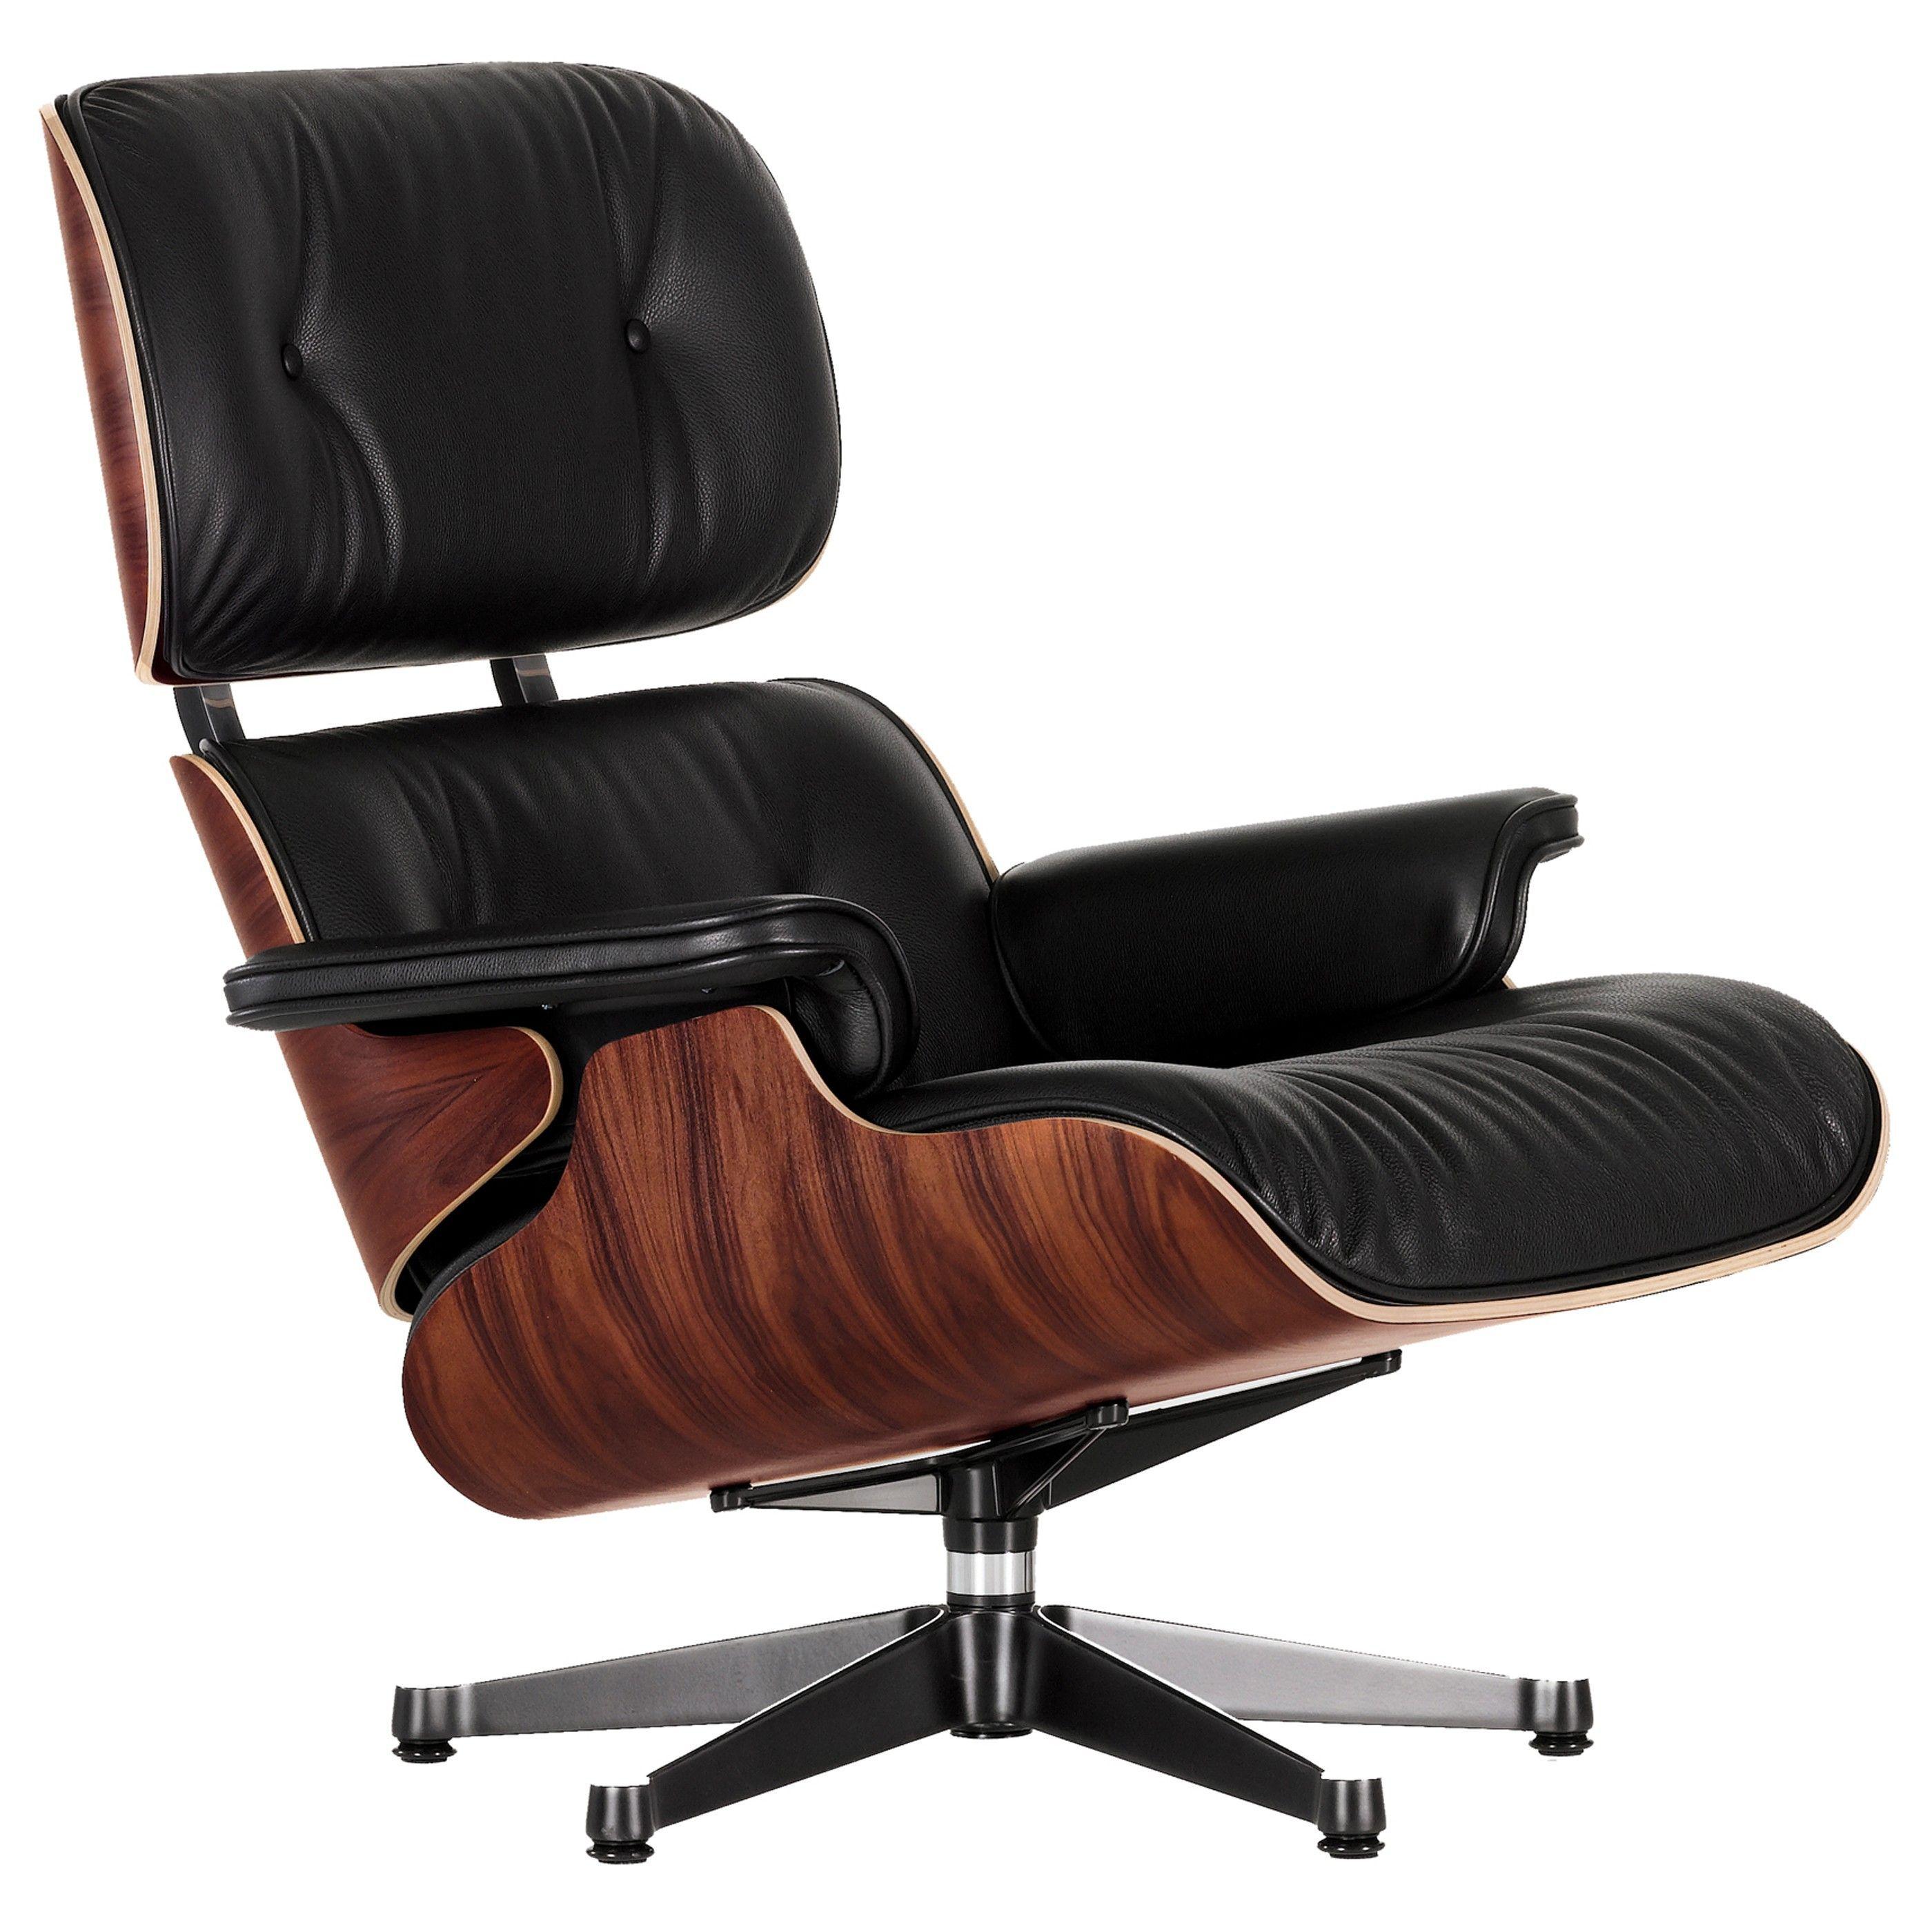 Vitra Sessel Google Suche Vitra Lounge Chair Vitra Lounge Lounge Armchair